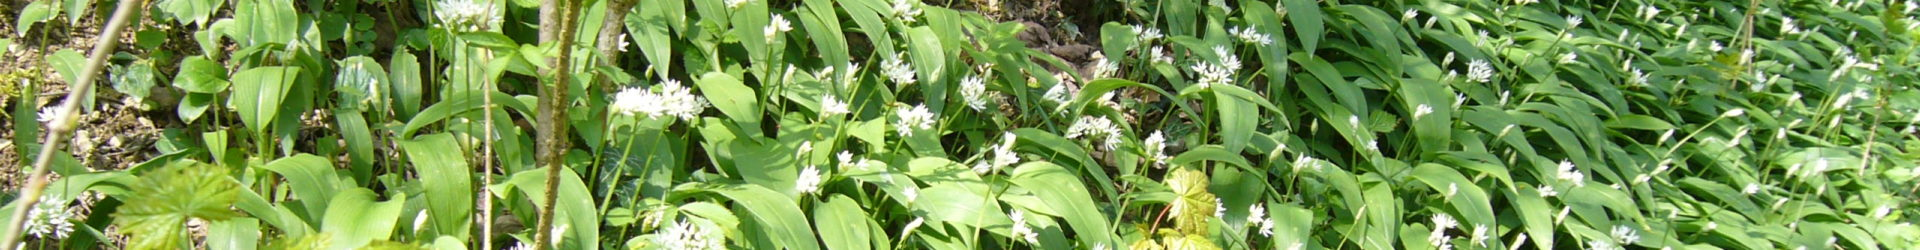 Qigong meets Wildpflanzen – Frühjahrsputz